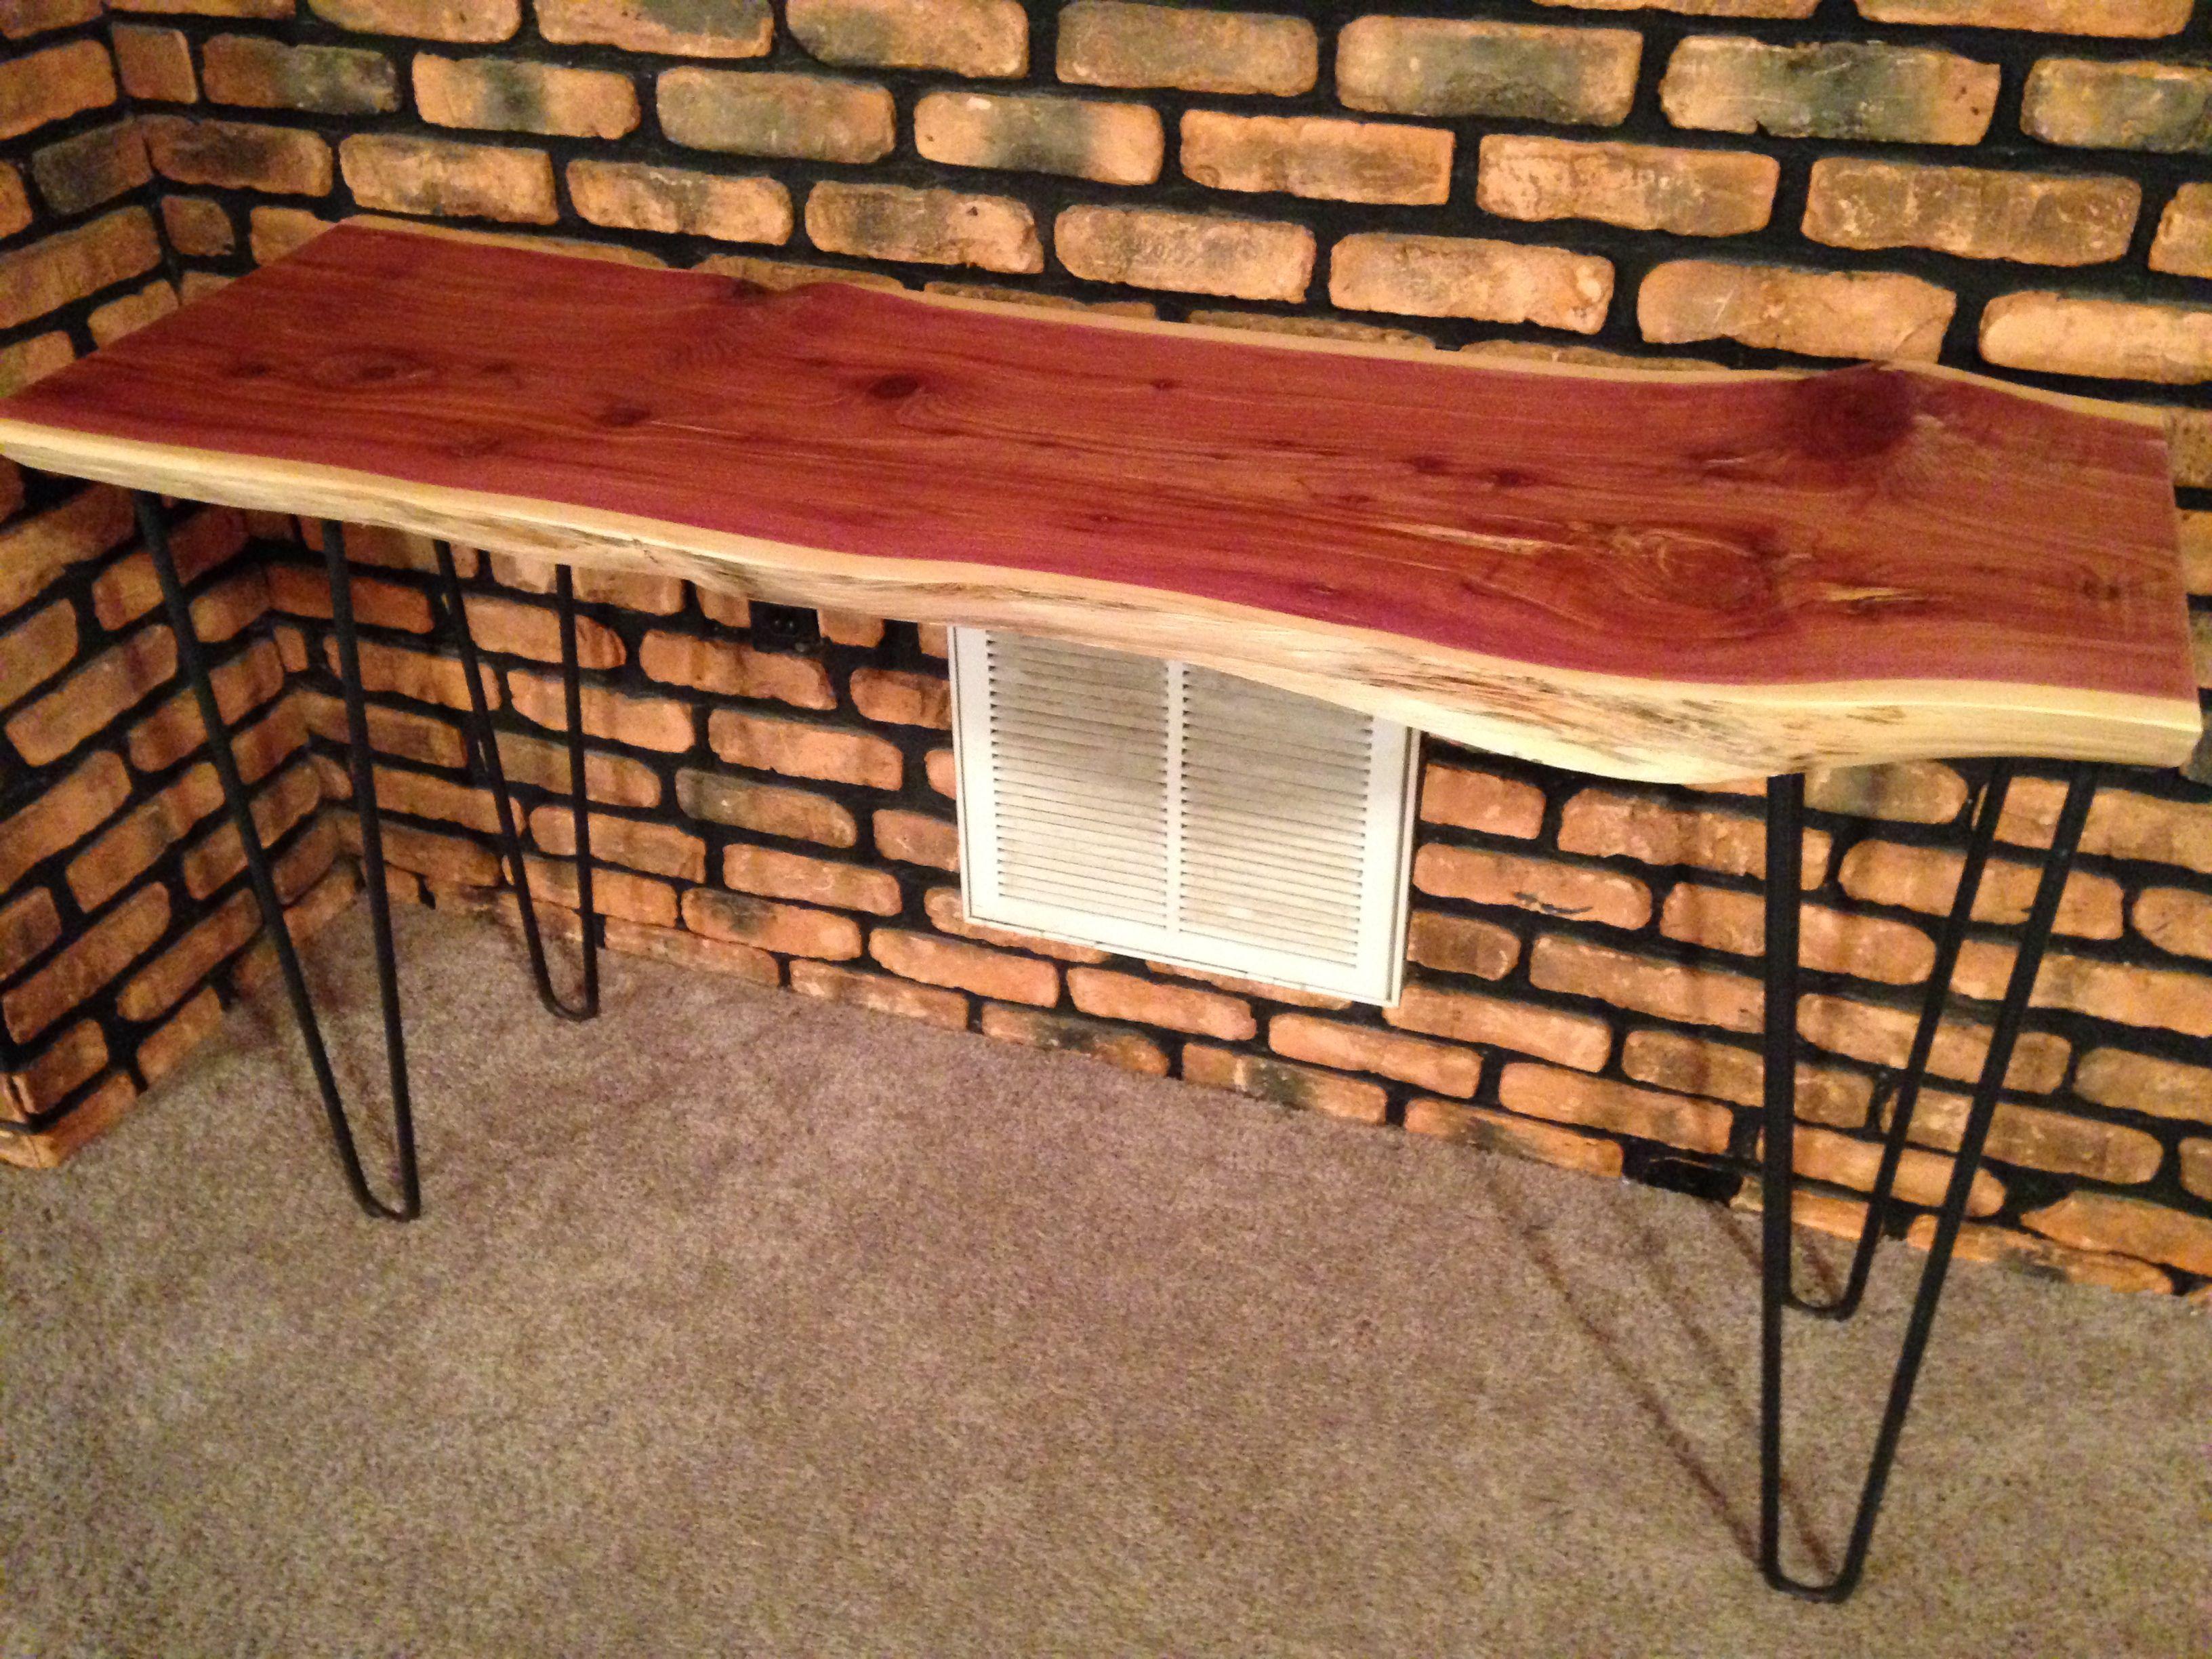 Buy handmade live edge cedar sofaconsole table with hairpin legs custom made live edge cedar sofaconsole table with hairpin legs geotapseo Choice Image